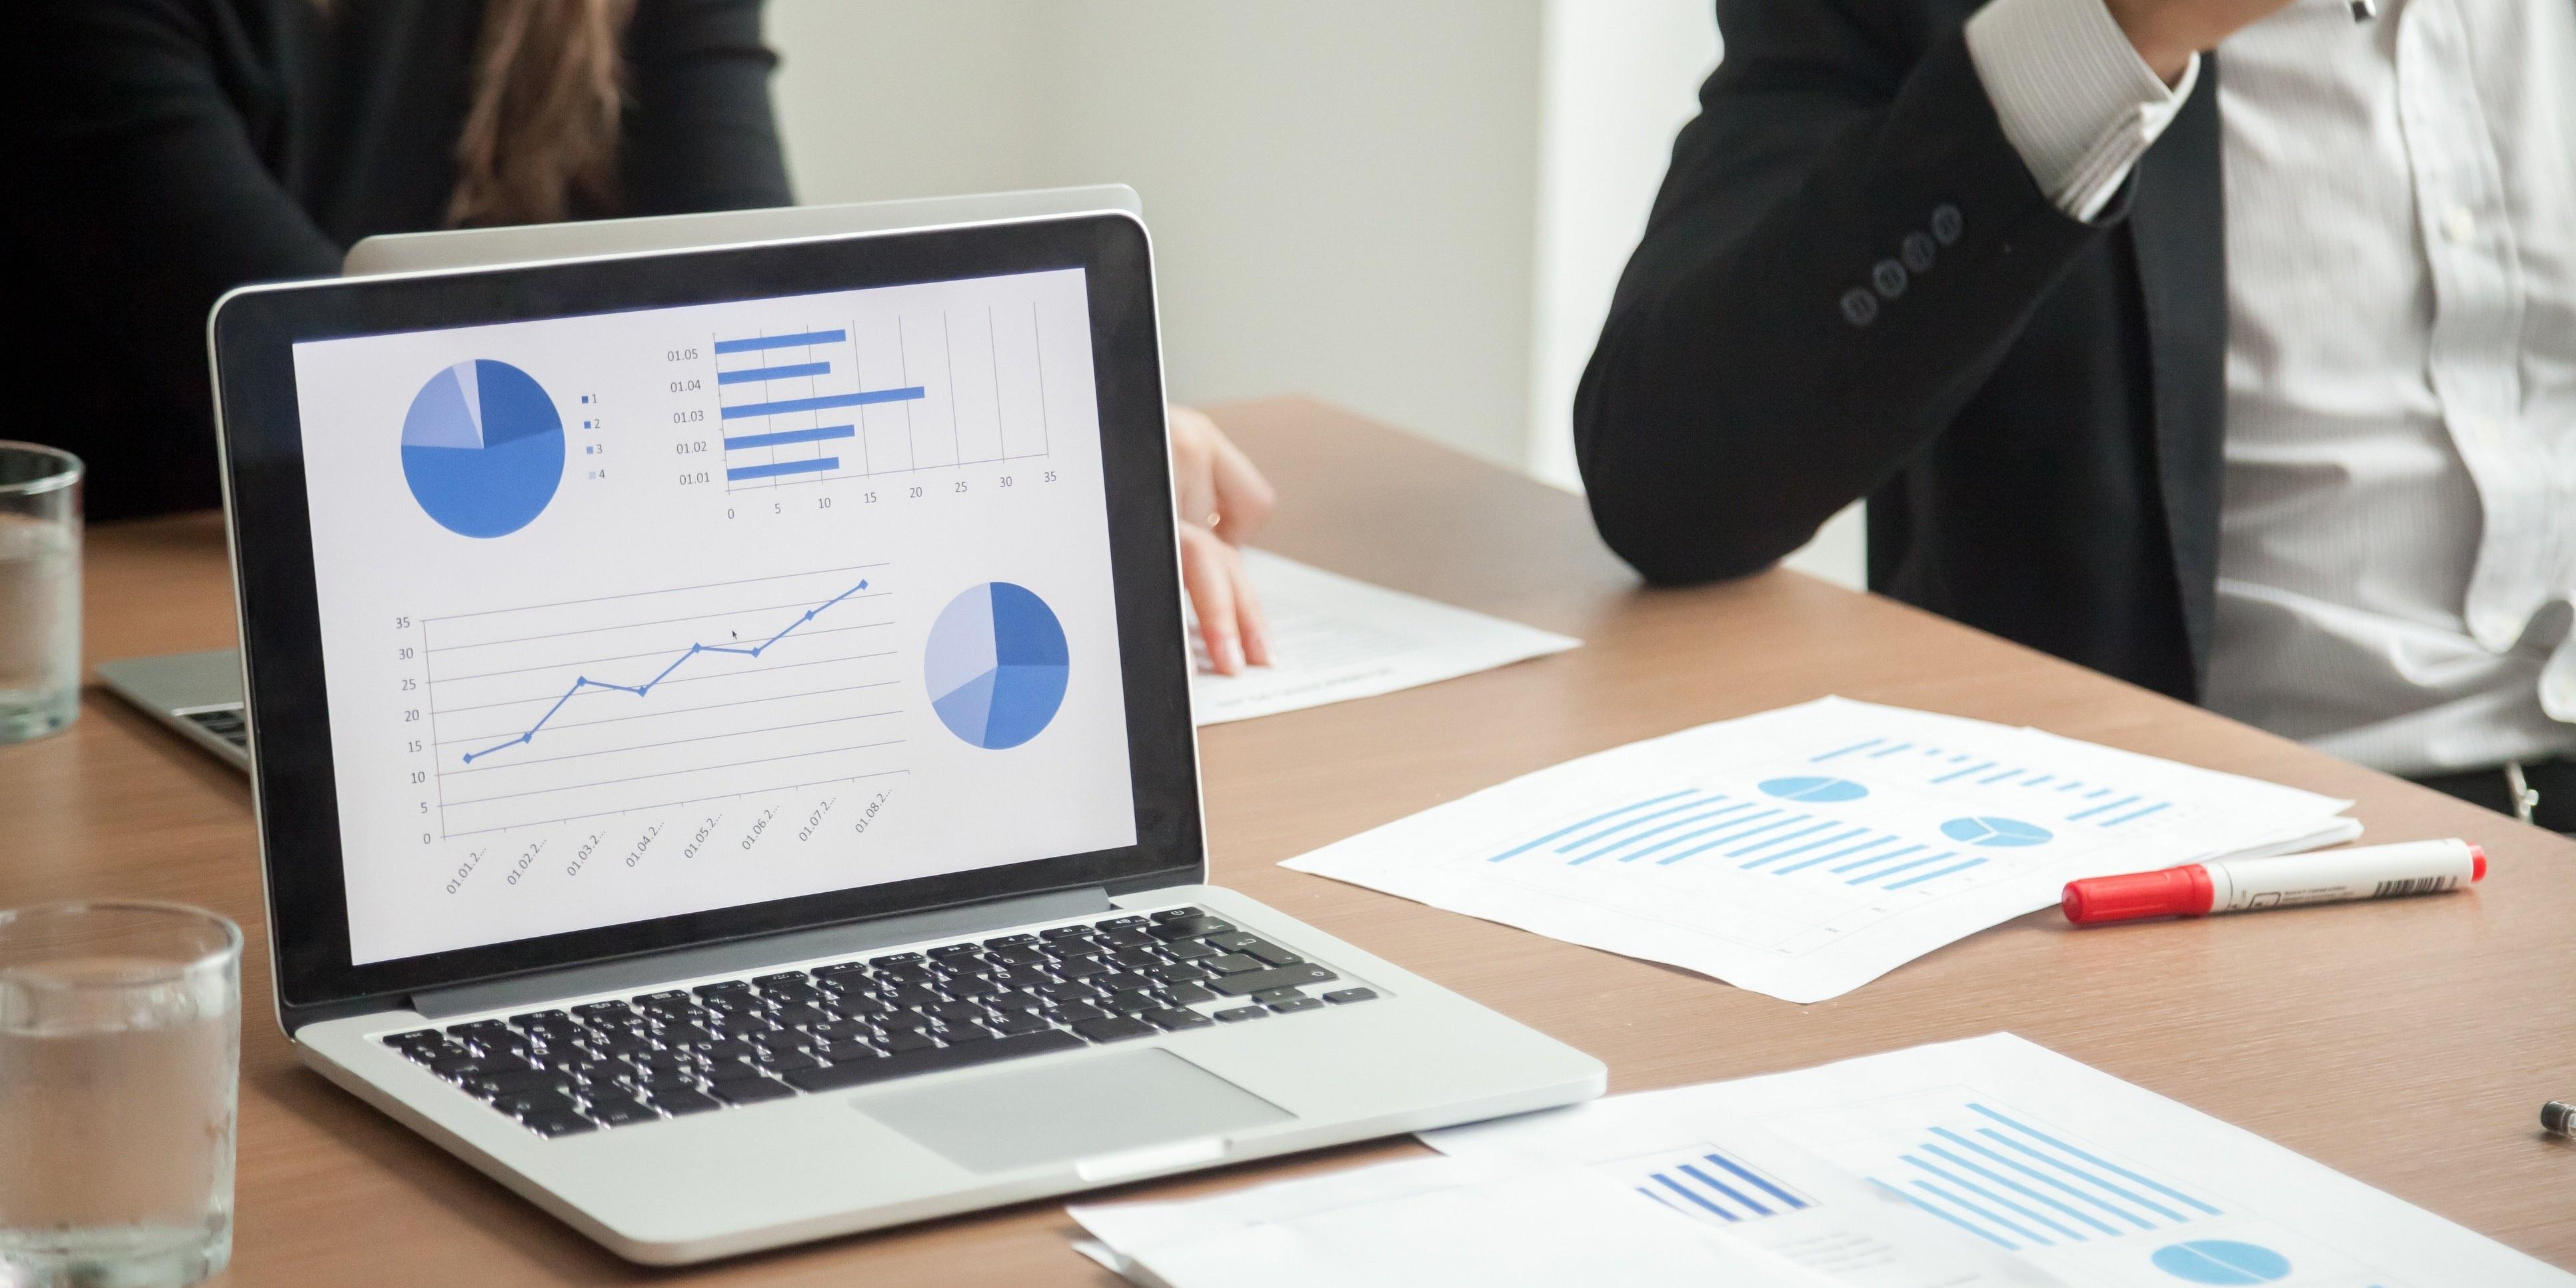 sales training to drive digital sales